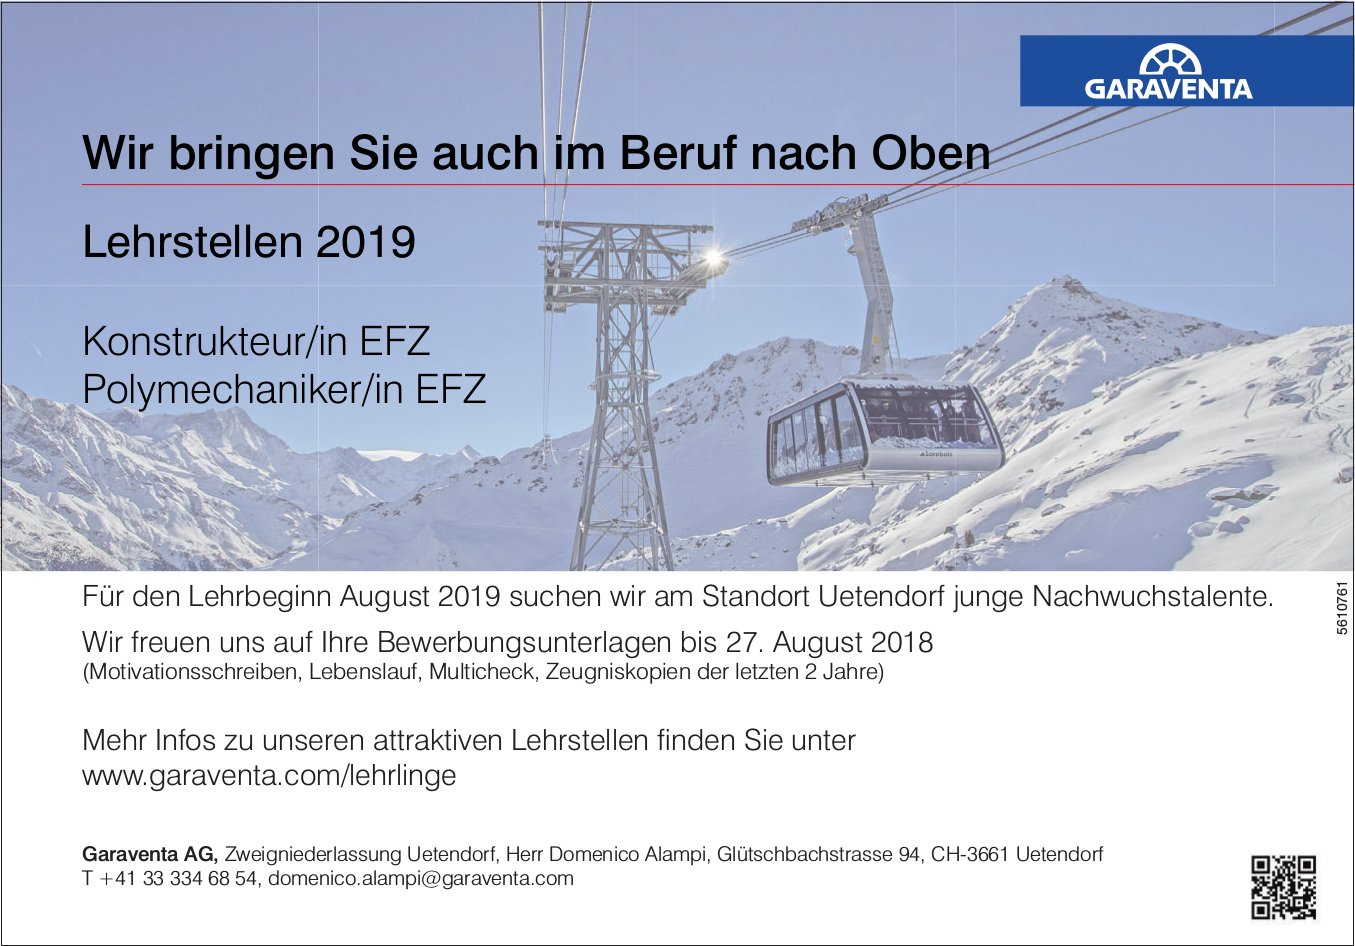 Lehrstellen 2019 als Konstrukteur/in EFZ Polymechaniker/in EFZ, Garaventa AG, Uetendorf, zu vergeben